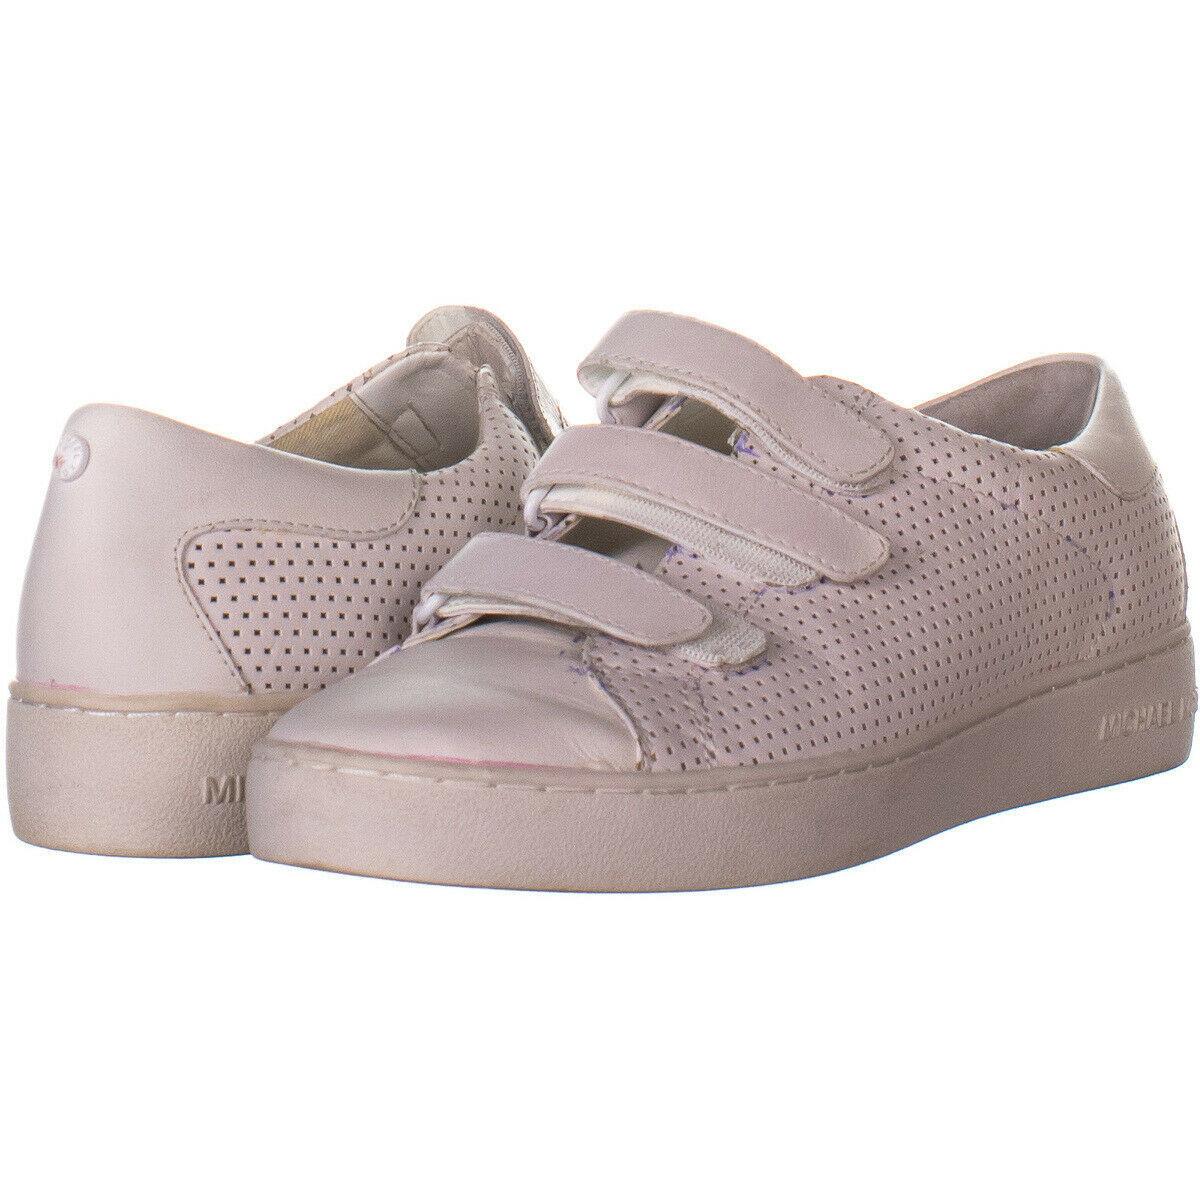 39c88f78fc34 Michael Kors Sneaker  1 customer review and 262 listings